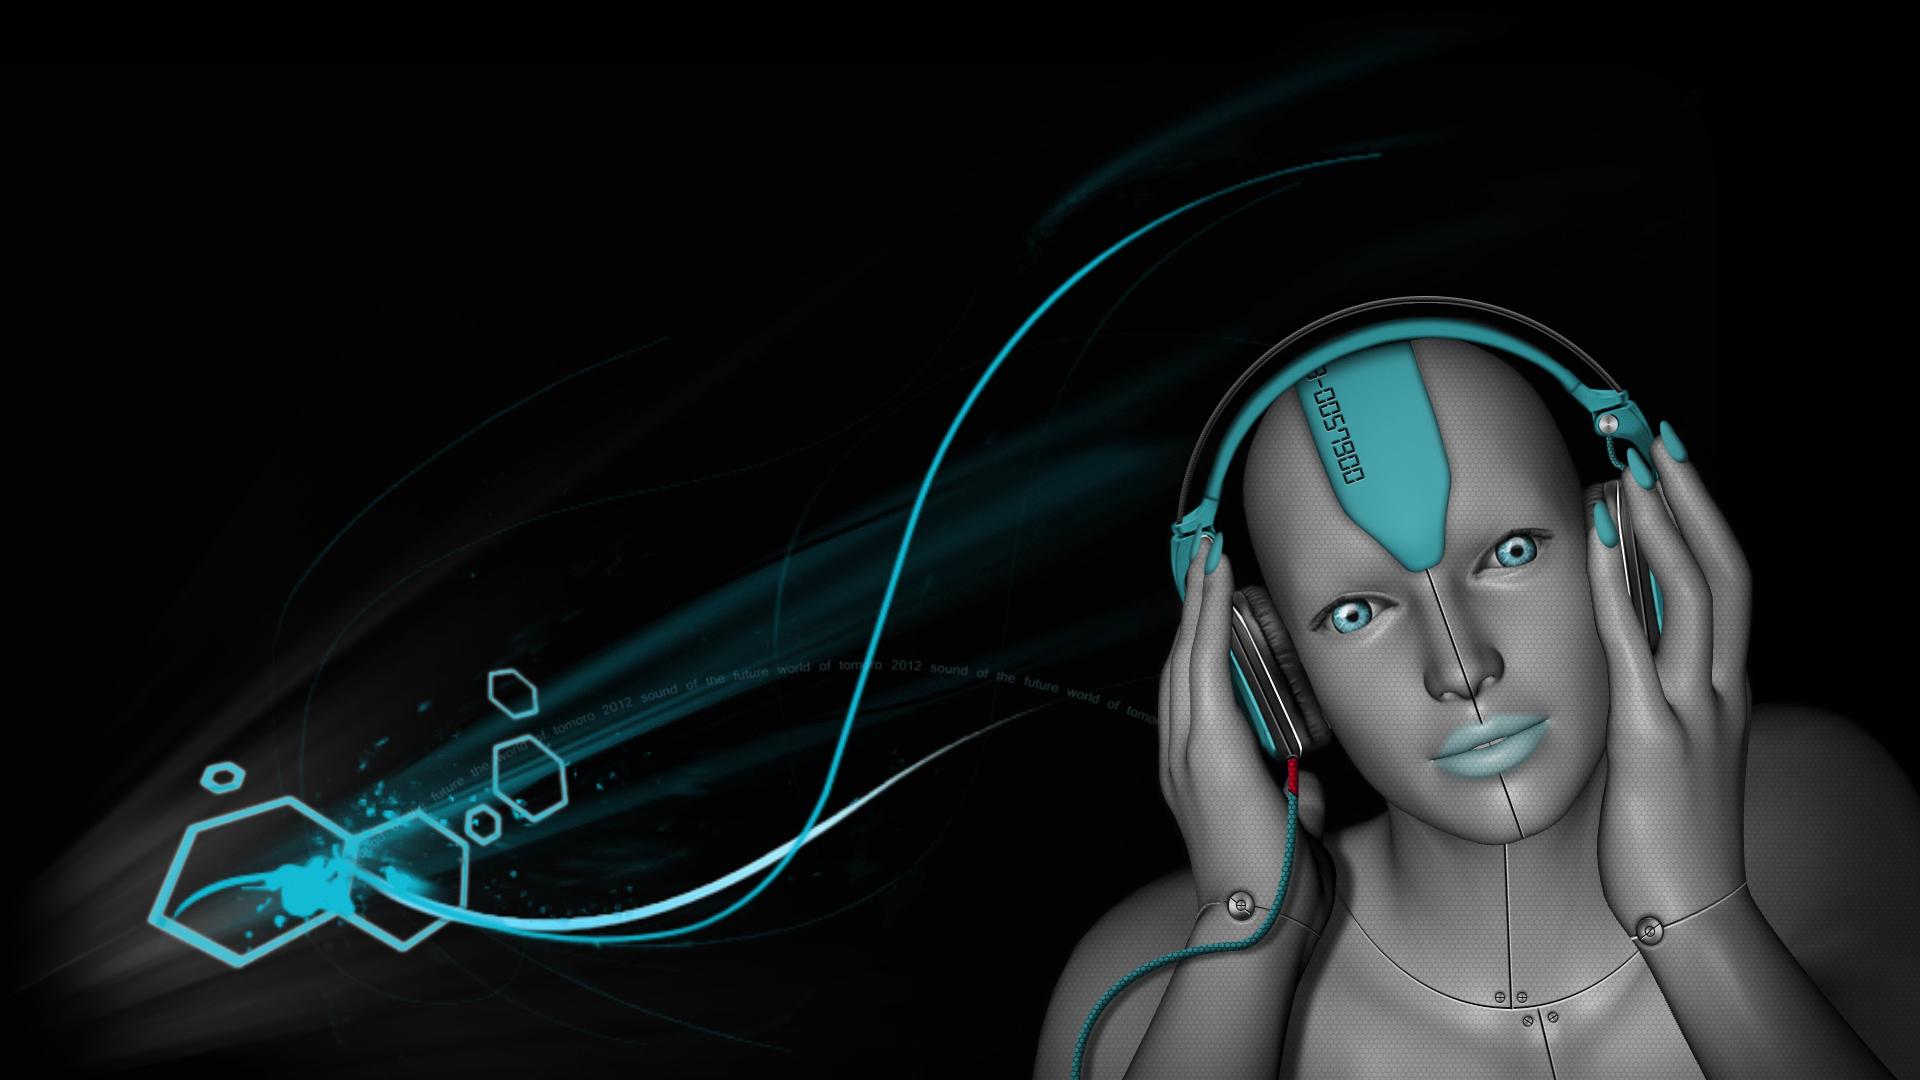 Wallpapers Hd 3d Music: 3D Music Wallpapers